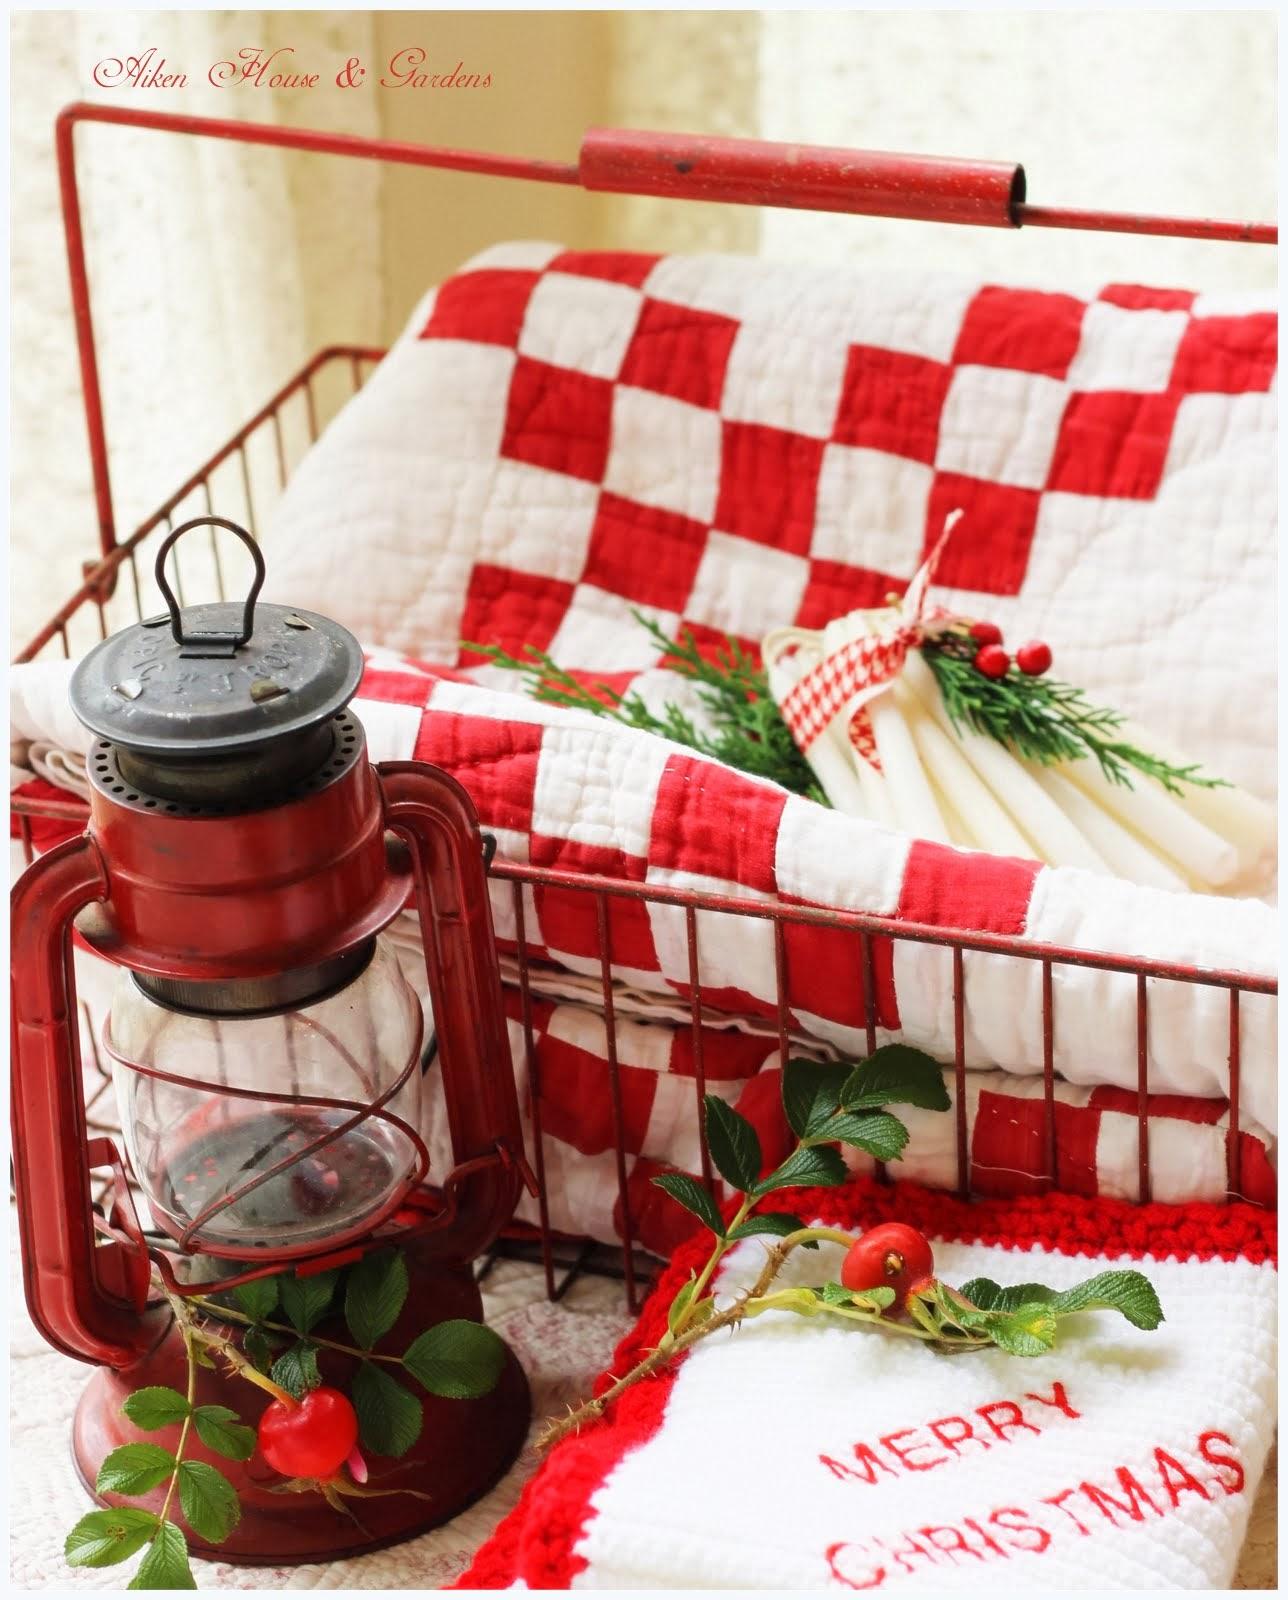 Aiken House & Gardens: More Red & White Kitchen Touches